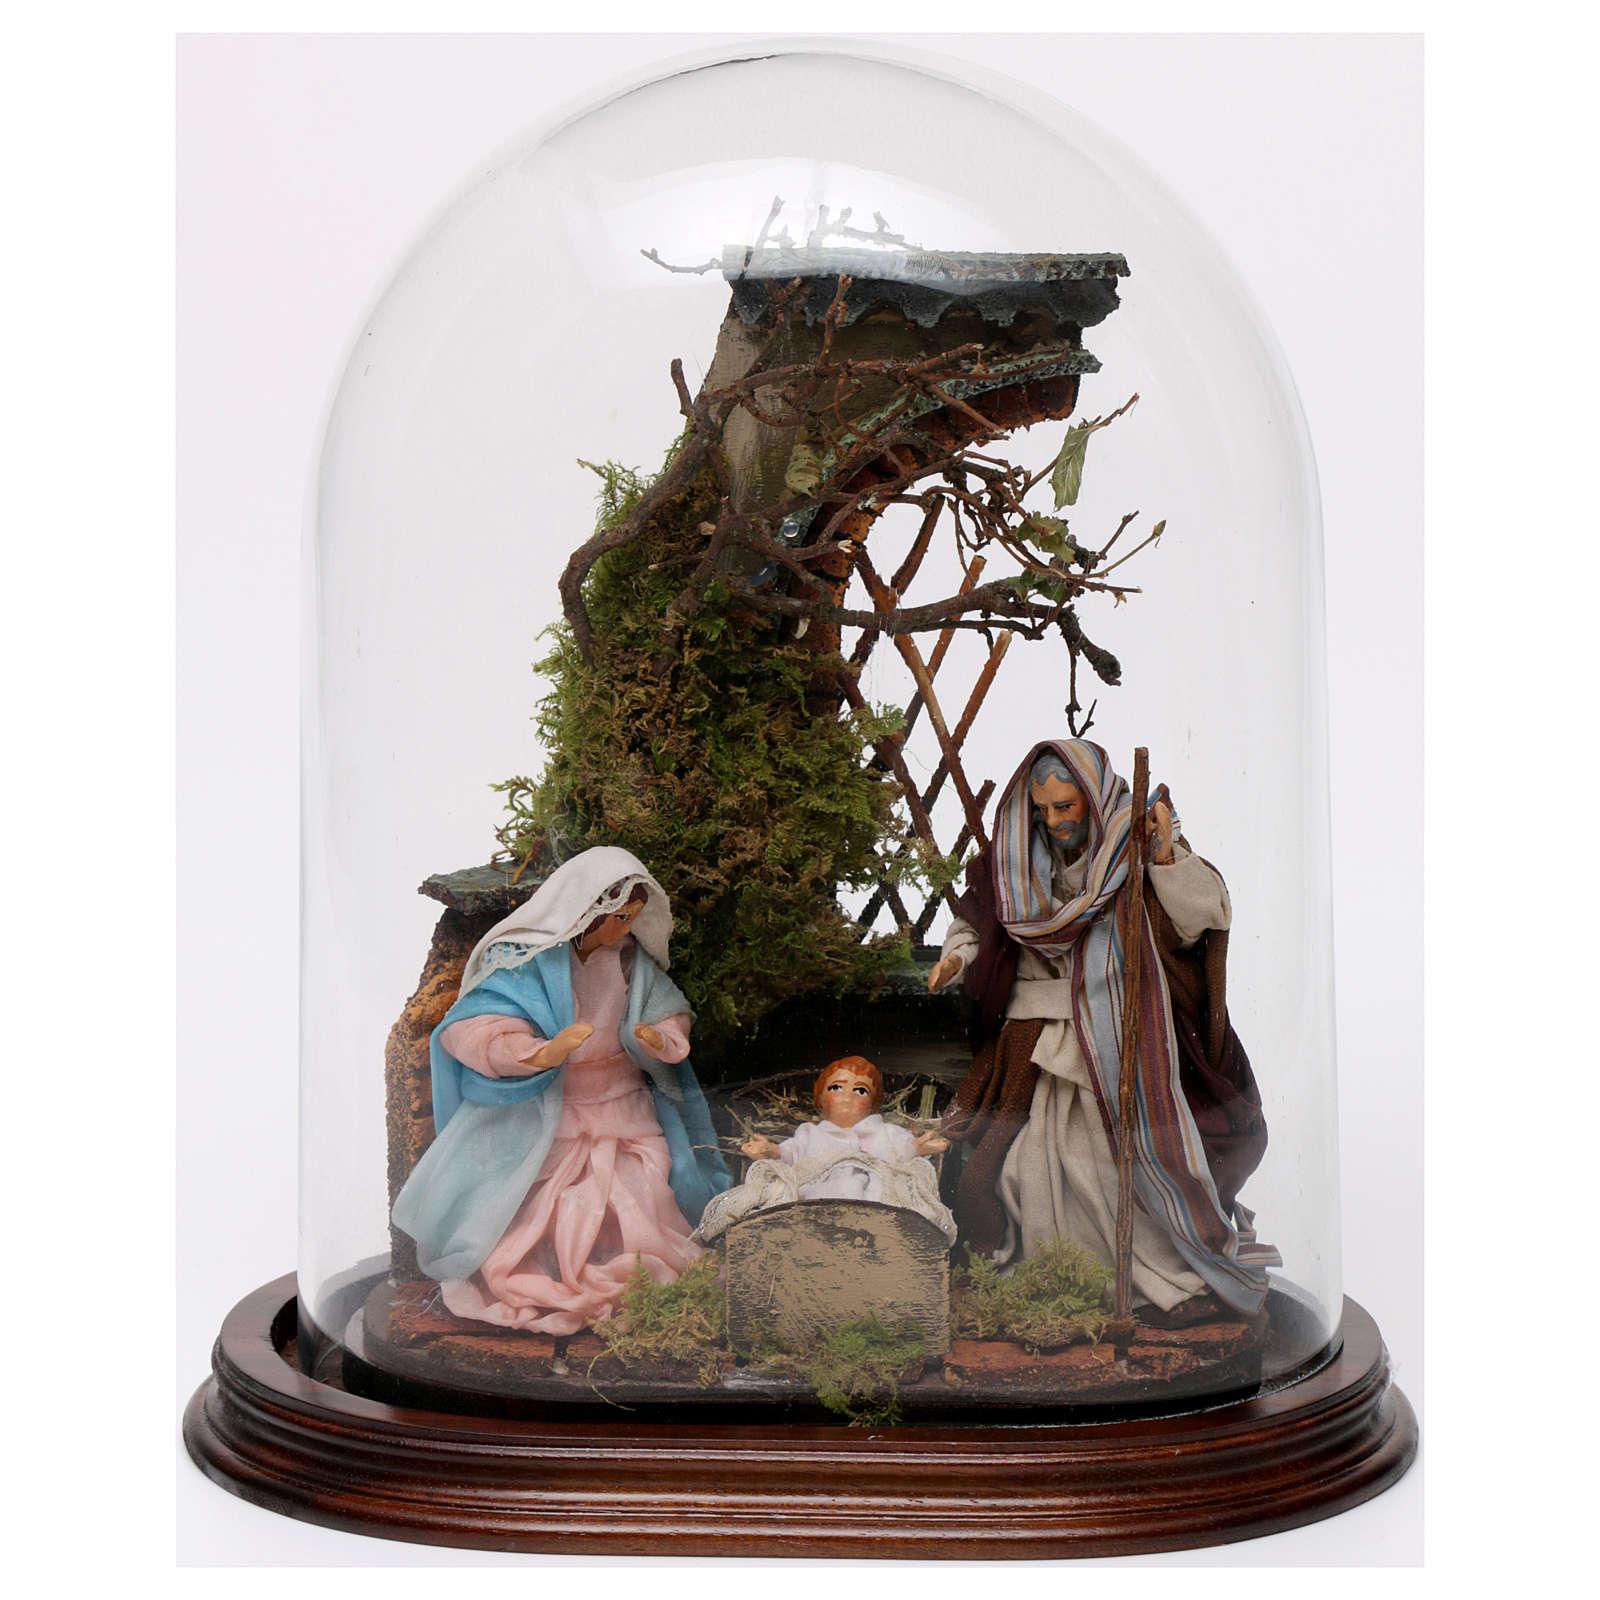 Sagrada Familia campana de vidrio en base de madera belén napolitano 4